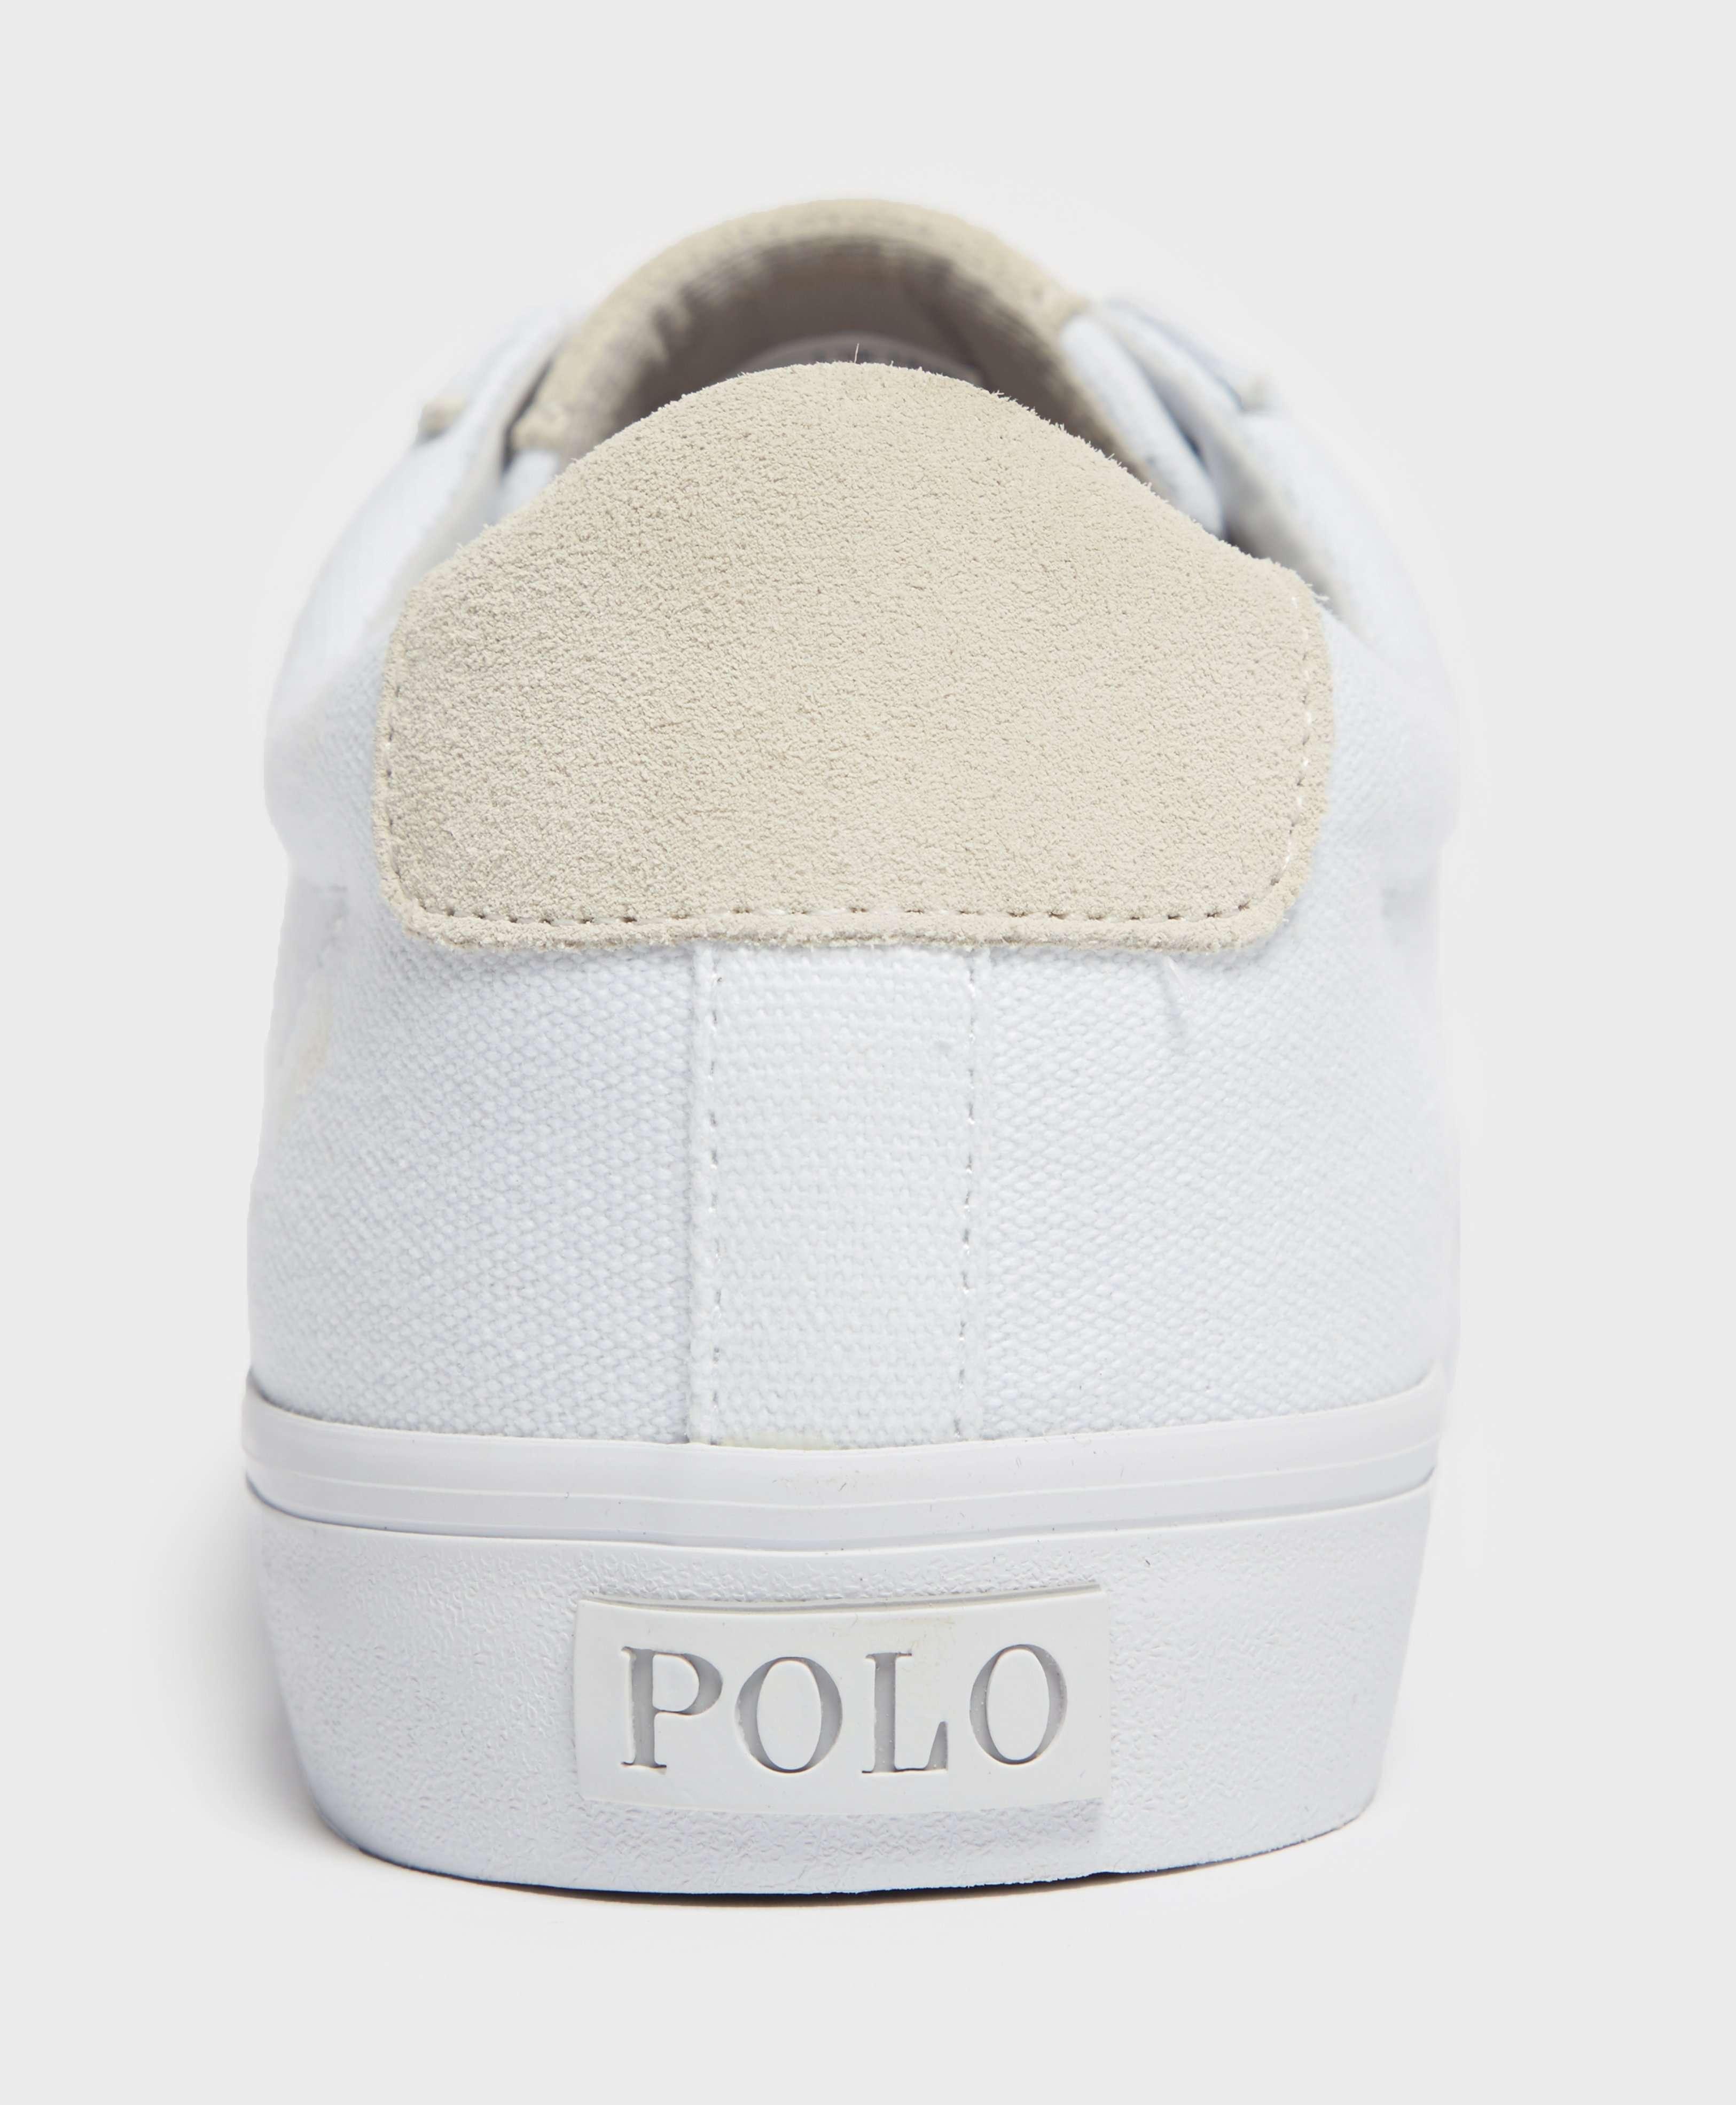 Polo Ralph Lauren Sayer Canvas Trainers